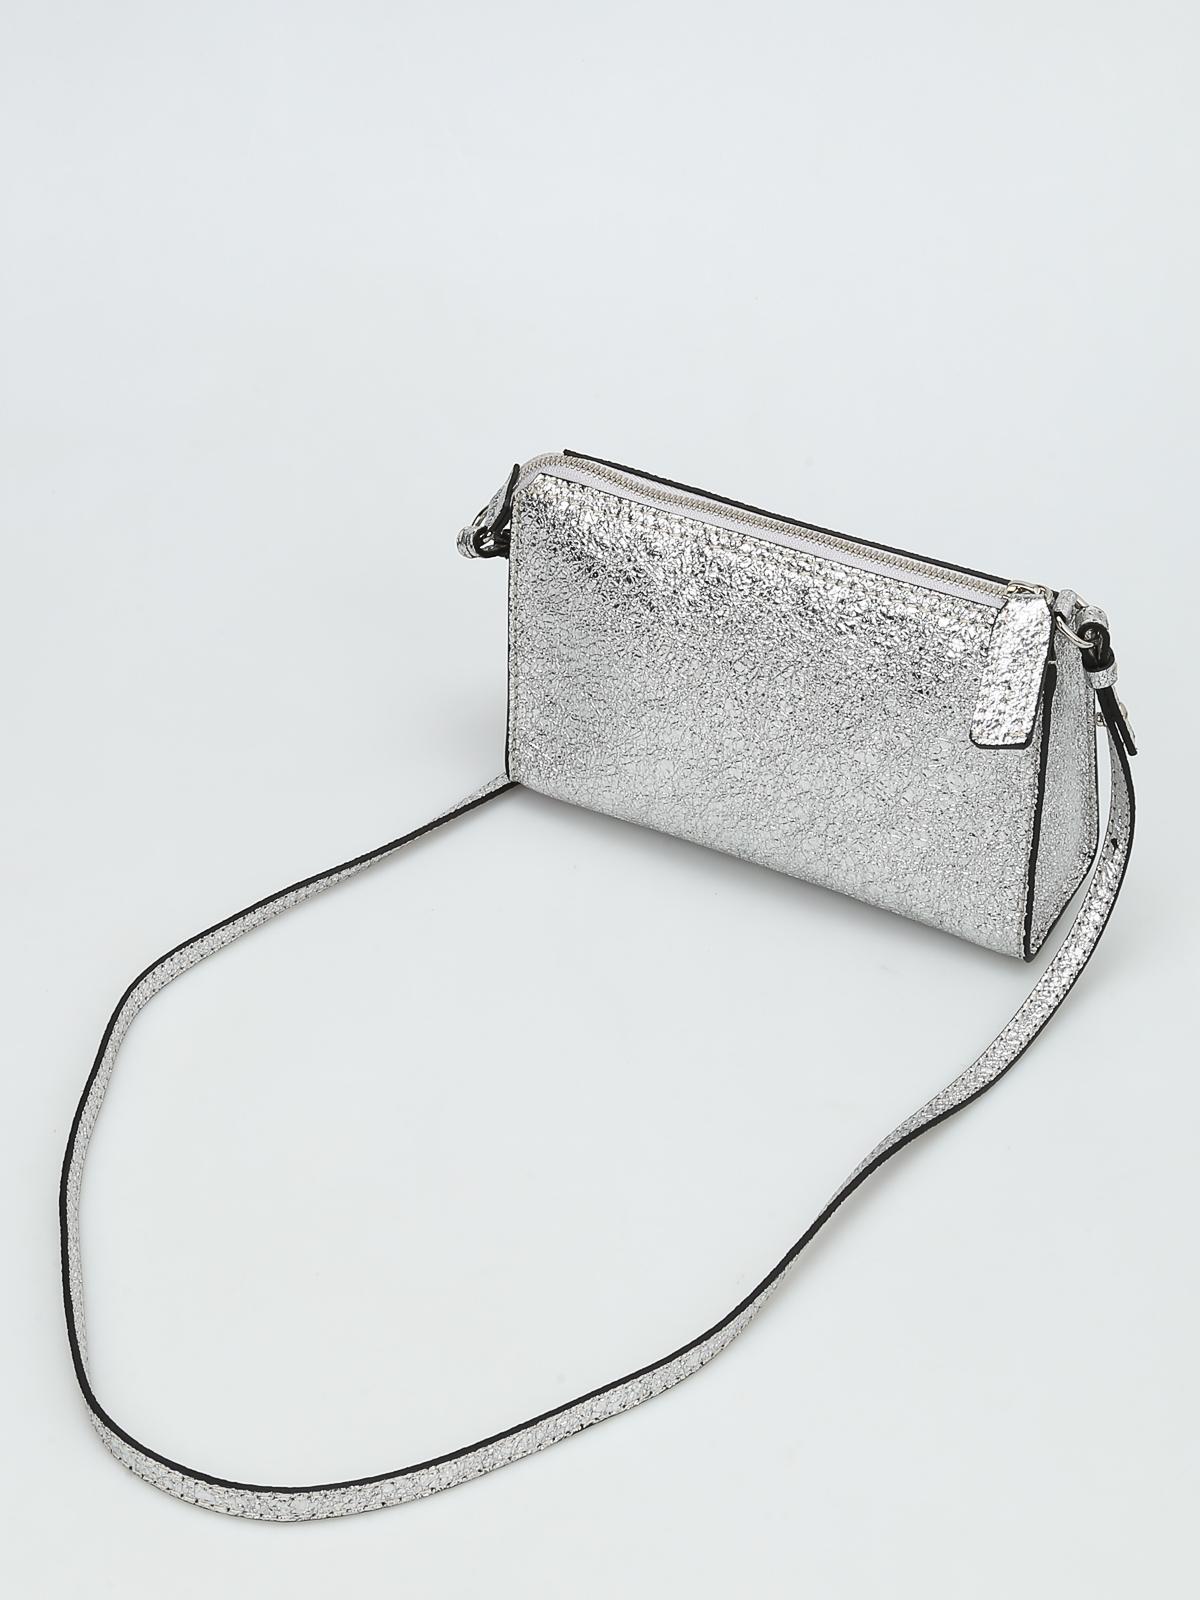 Effect Body Foil Nina Golden Bags Aluminium Bag Cross Goose fW0IWxwqAS